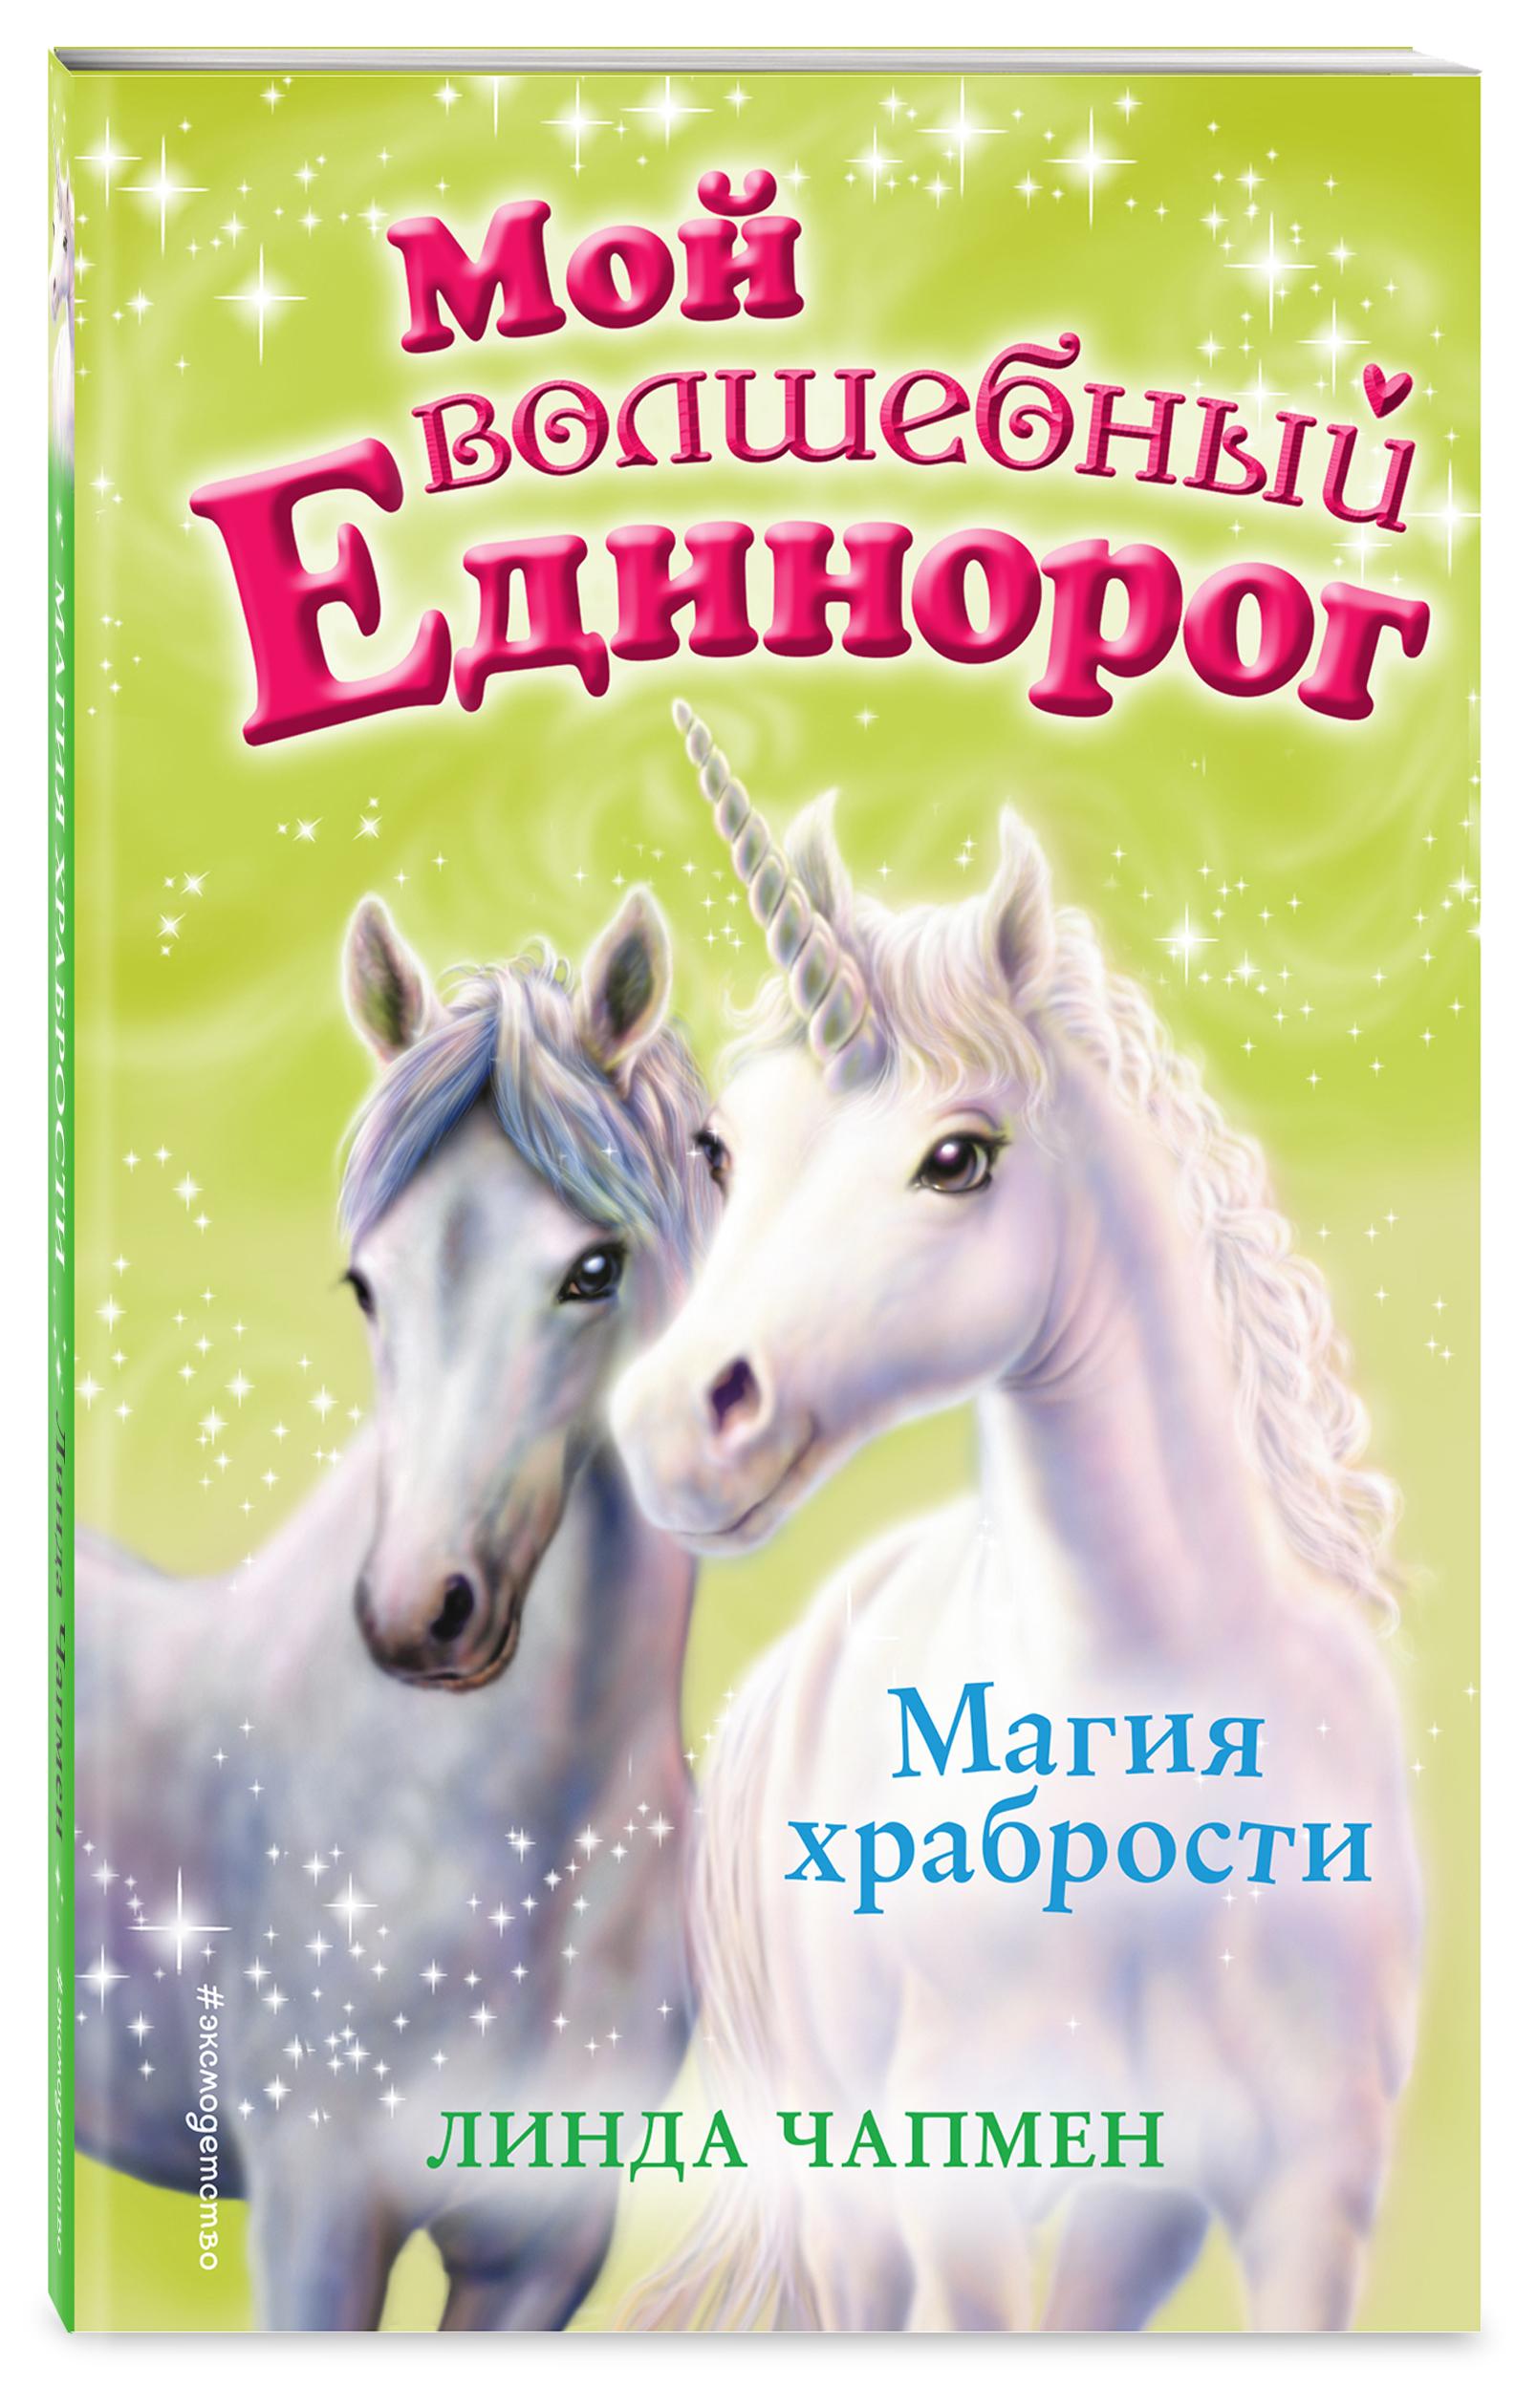 Линда Чапмен Магия храбрости линда чапмен магия дружбы